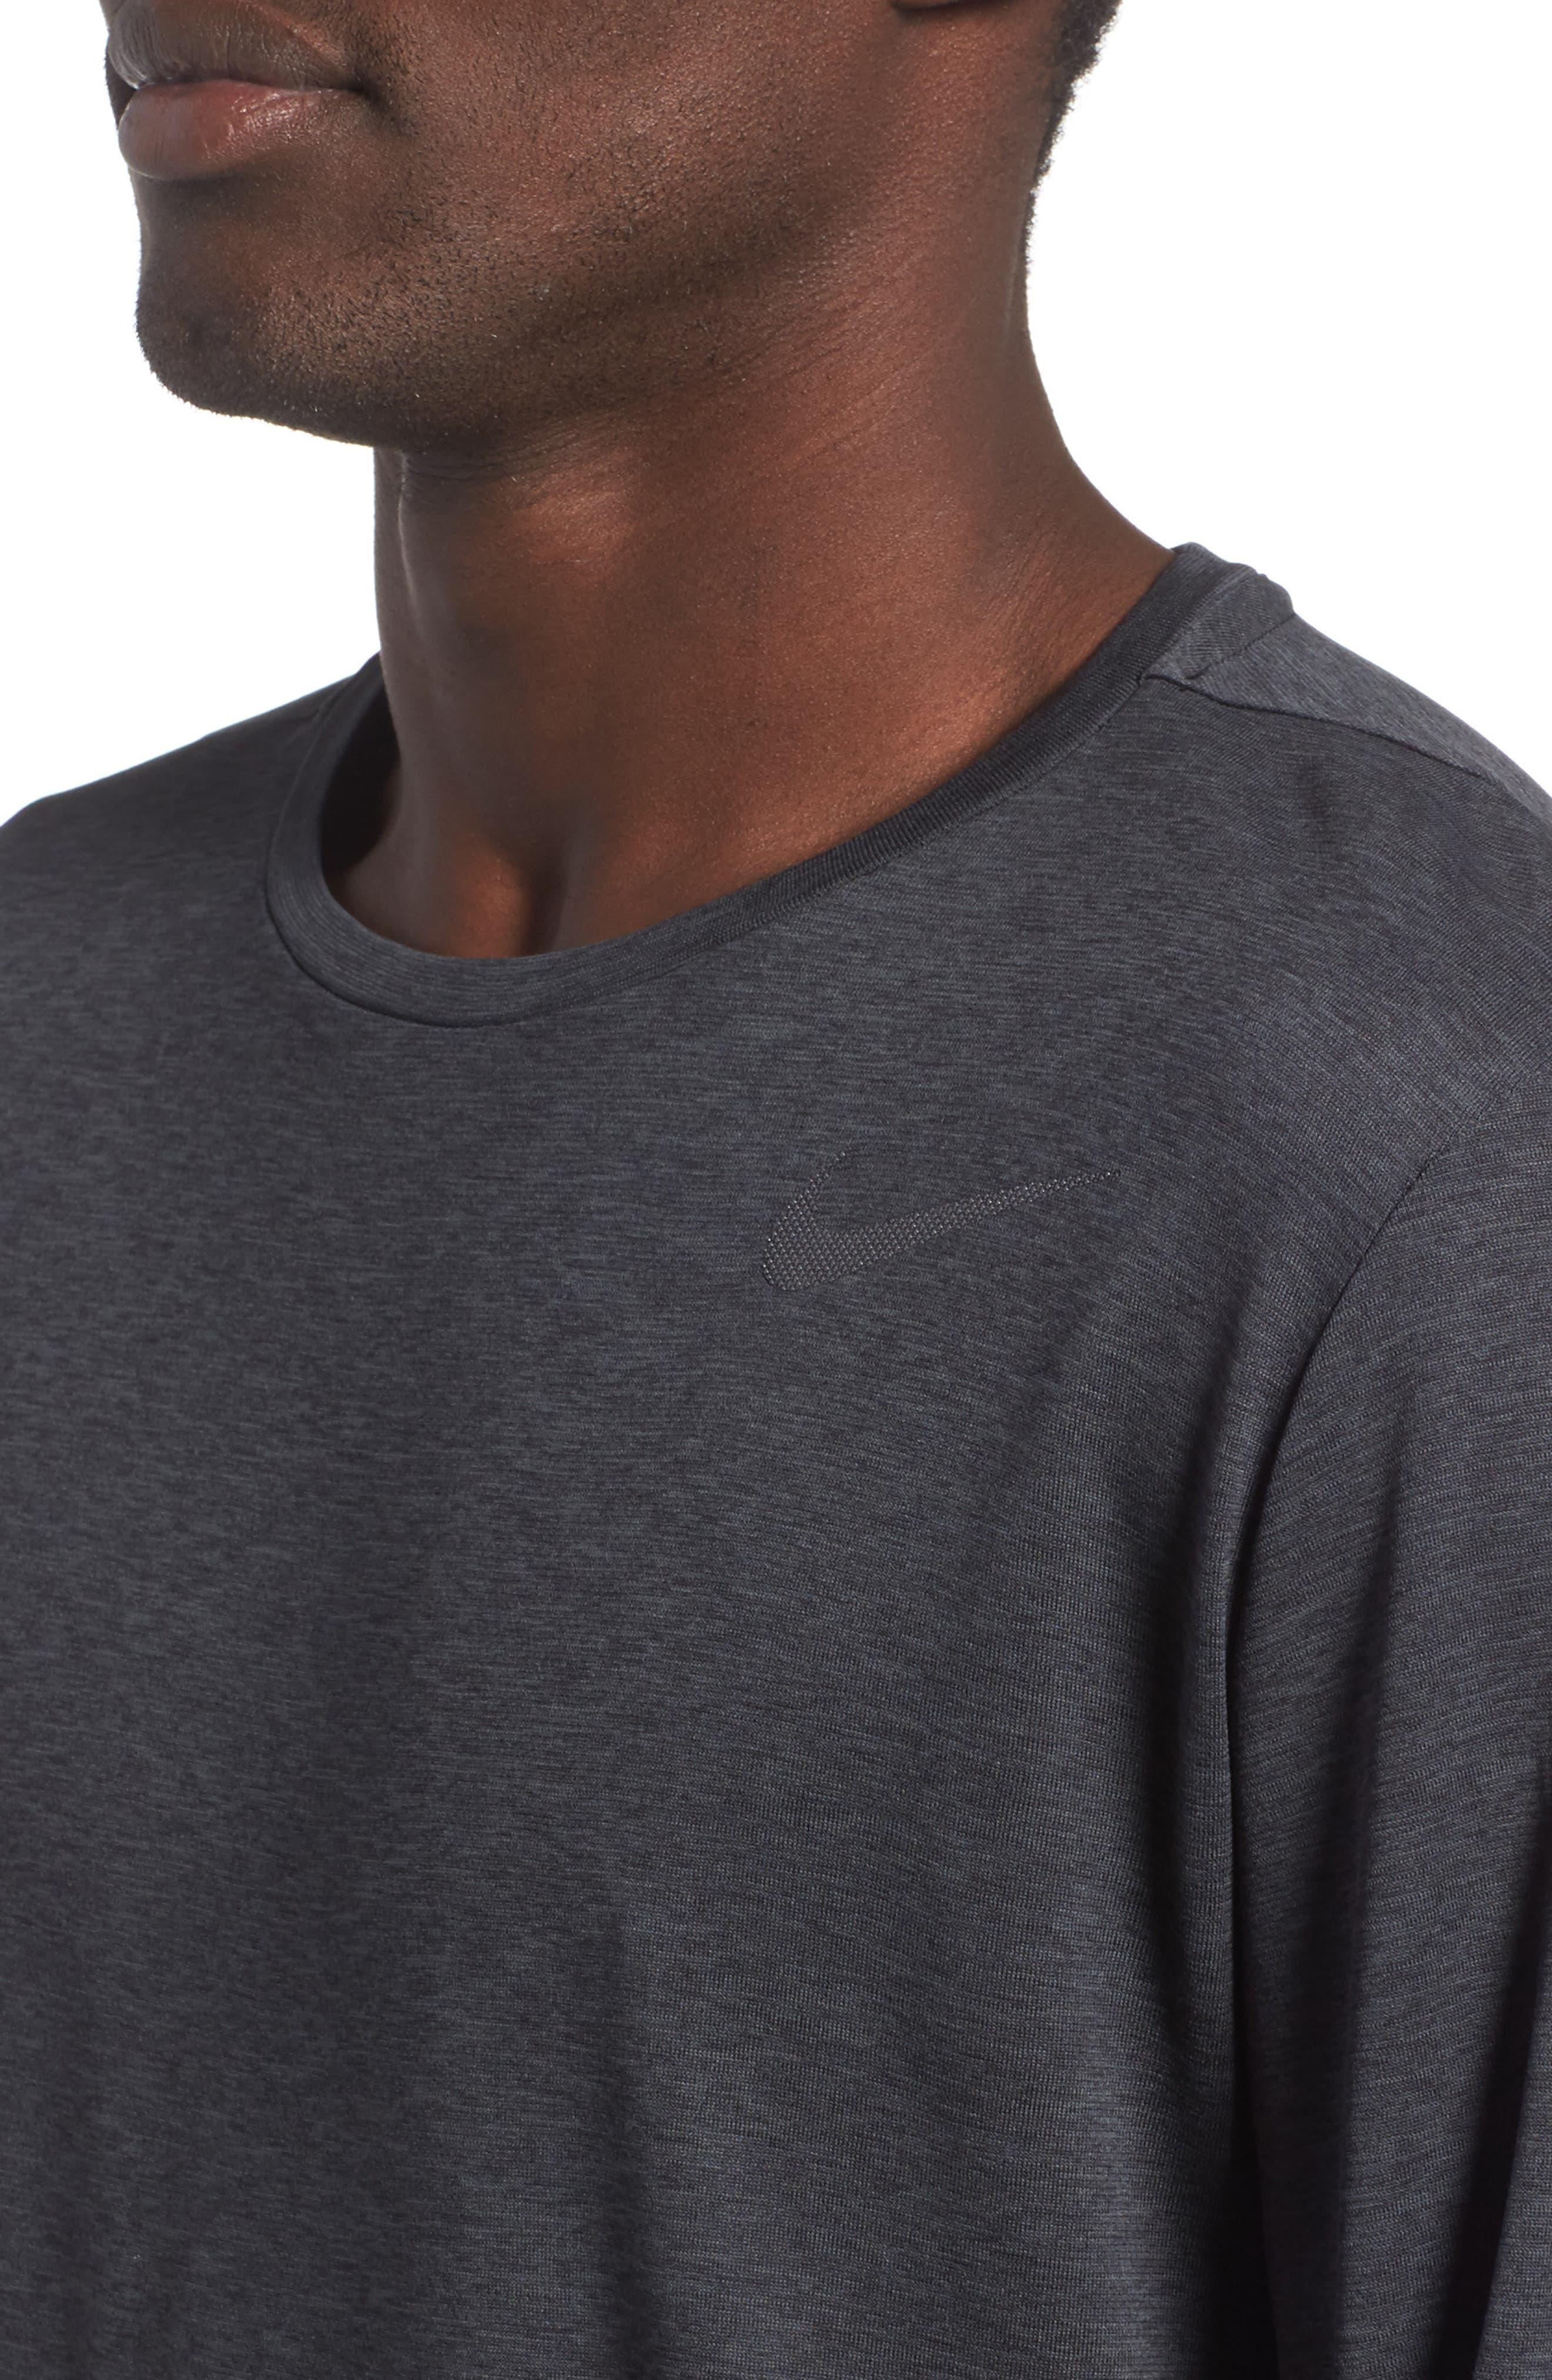 Long Sleeve Training T-Shirt,                             Alternate thumbnail 4, color,                             Black/ Anthracite/ Hematite